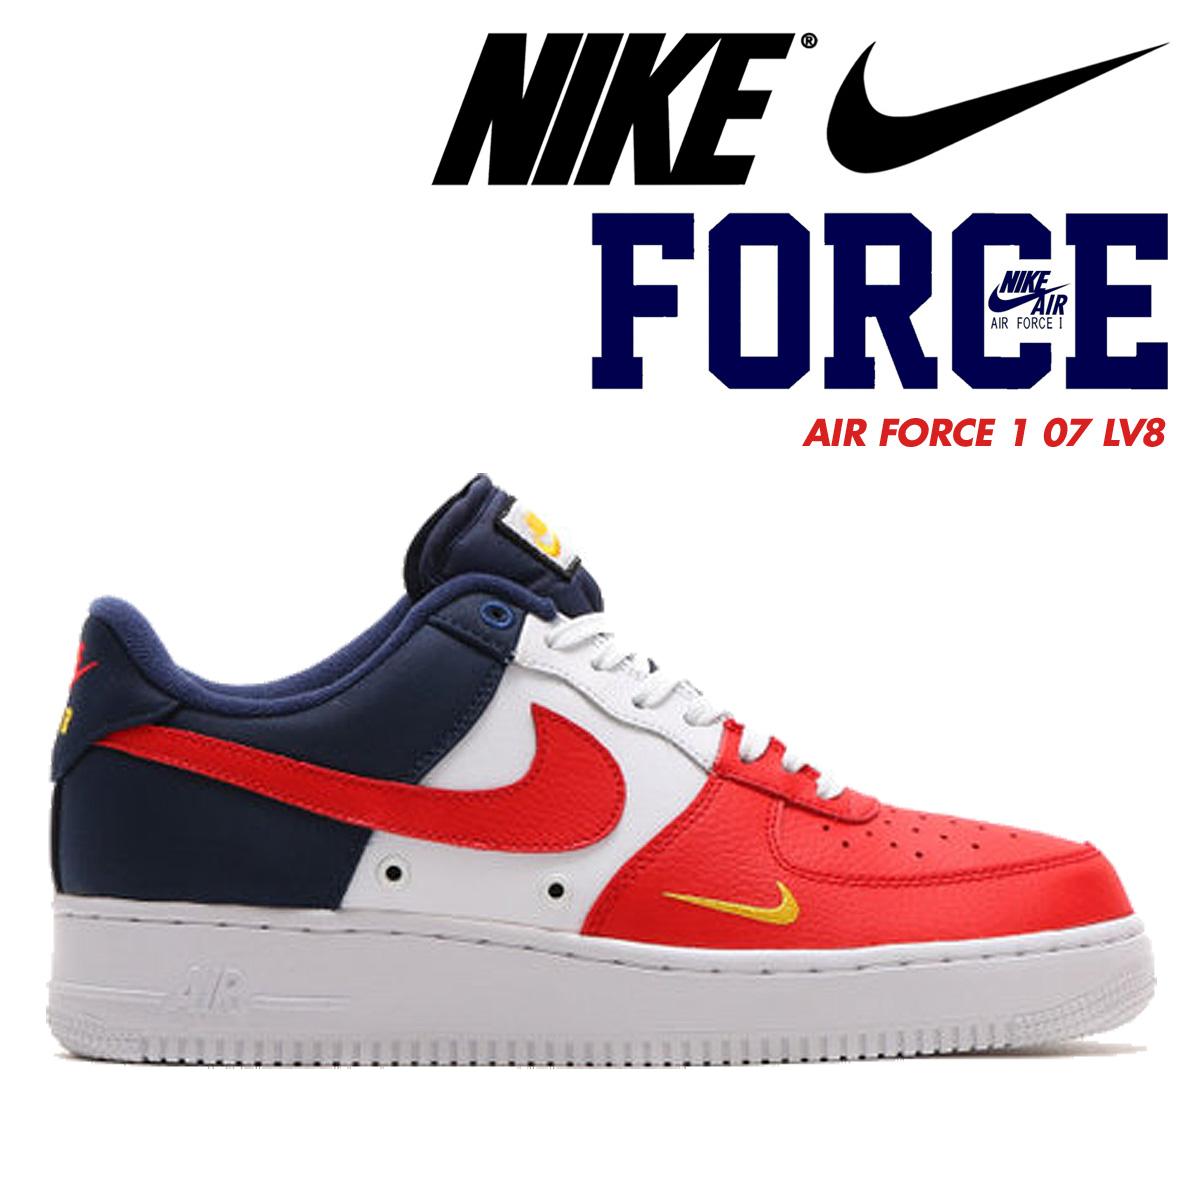 Nike NIKE air force 1 sneakers AIR FORCE 1 LOW 07 LV8 men low 823,511-601 shoes tricolor [6/15 Shinnyu load]